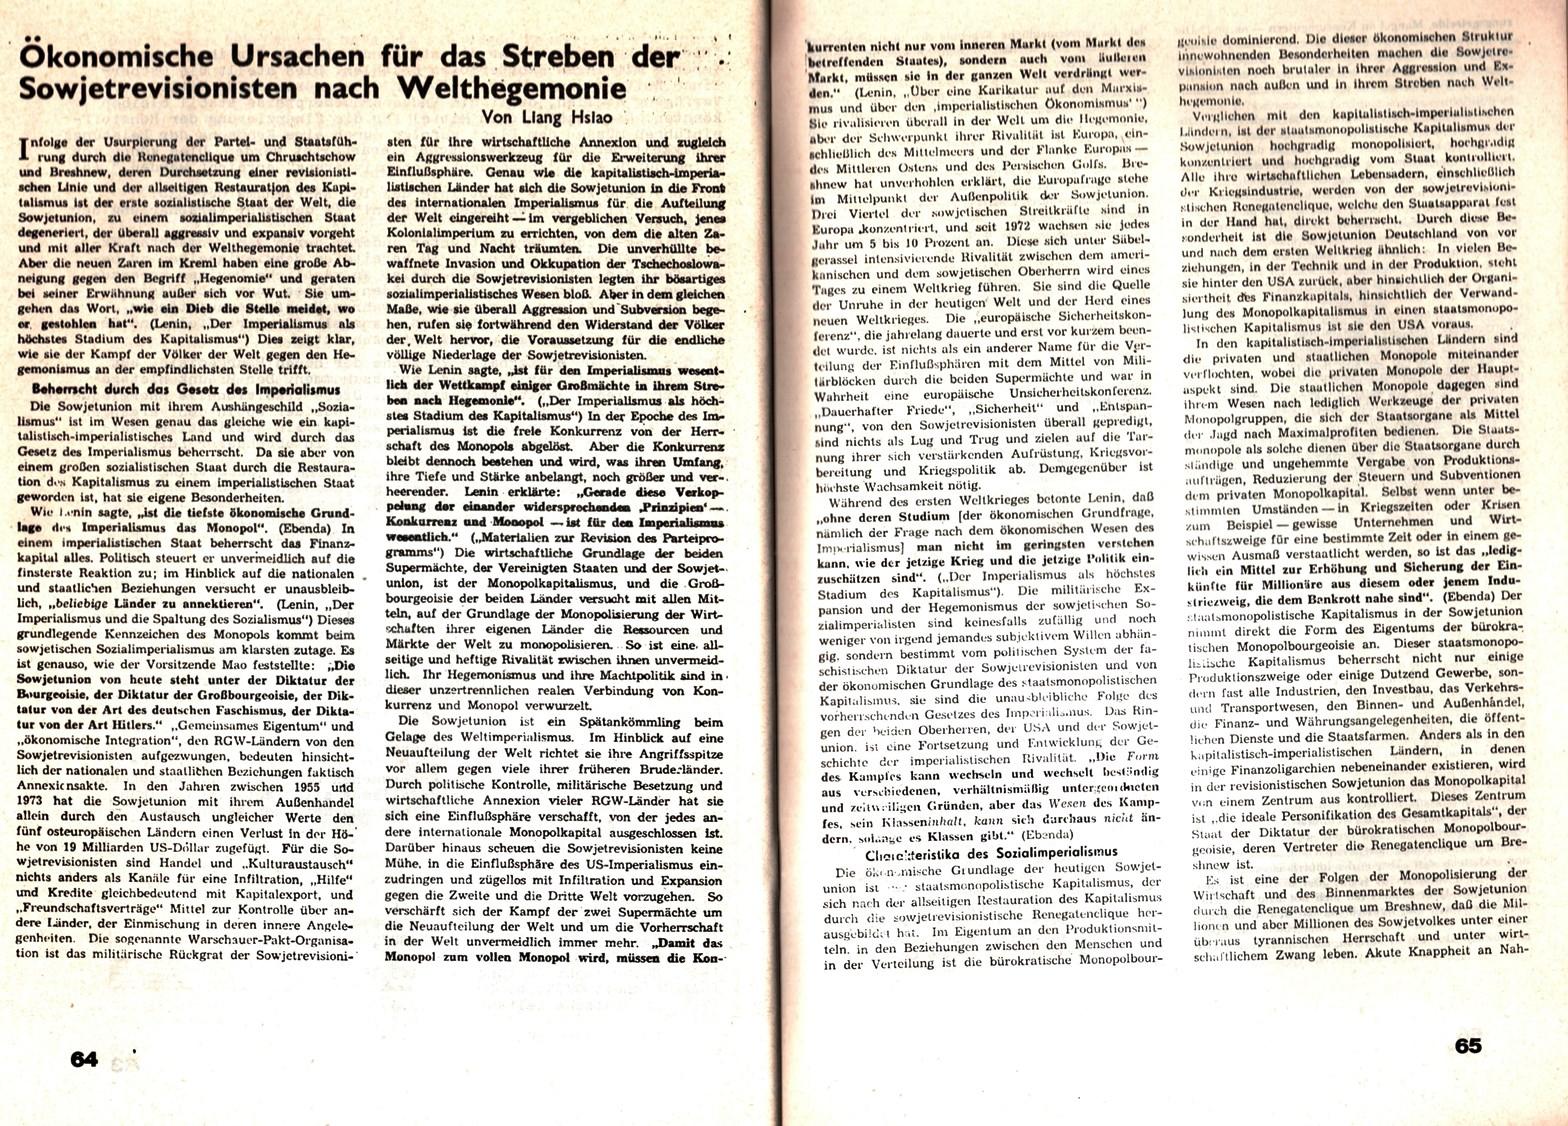 KSV_1976_Atomenergie_im_Kapitalismus_034